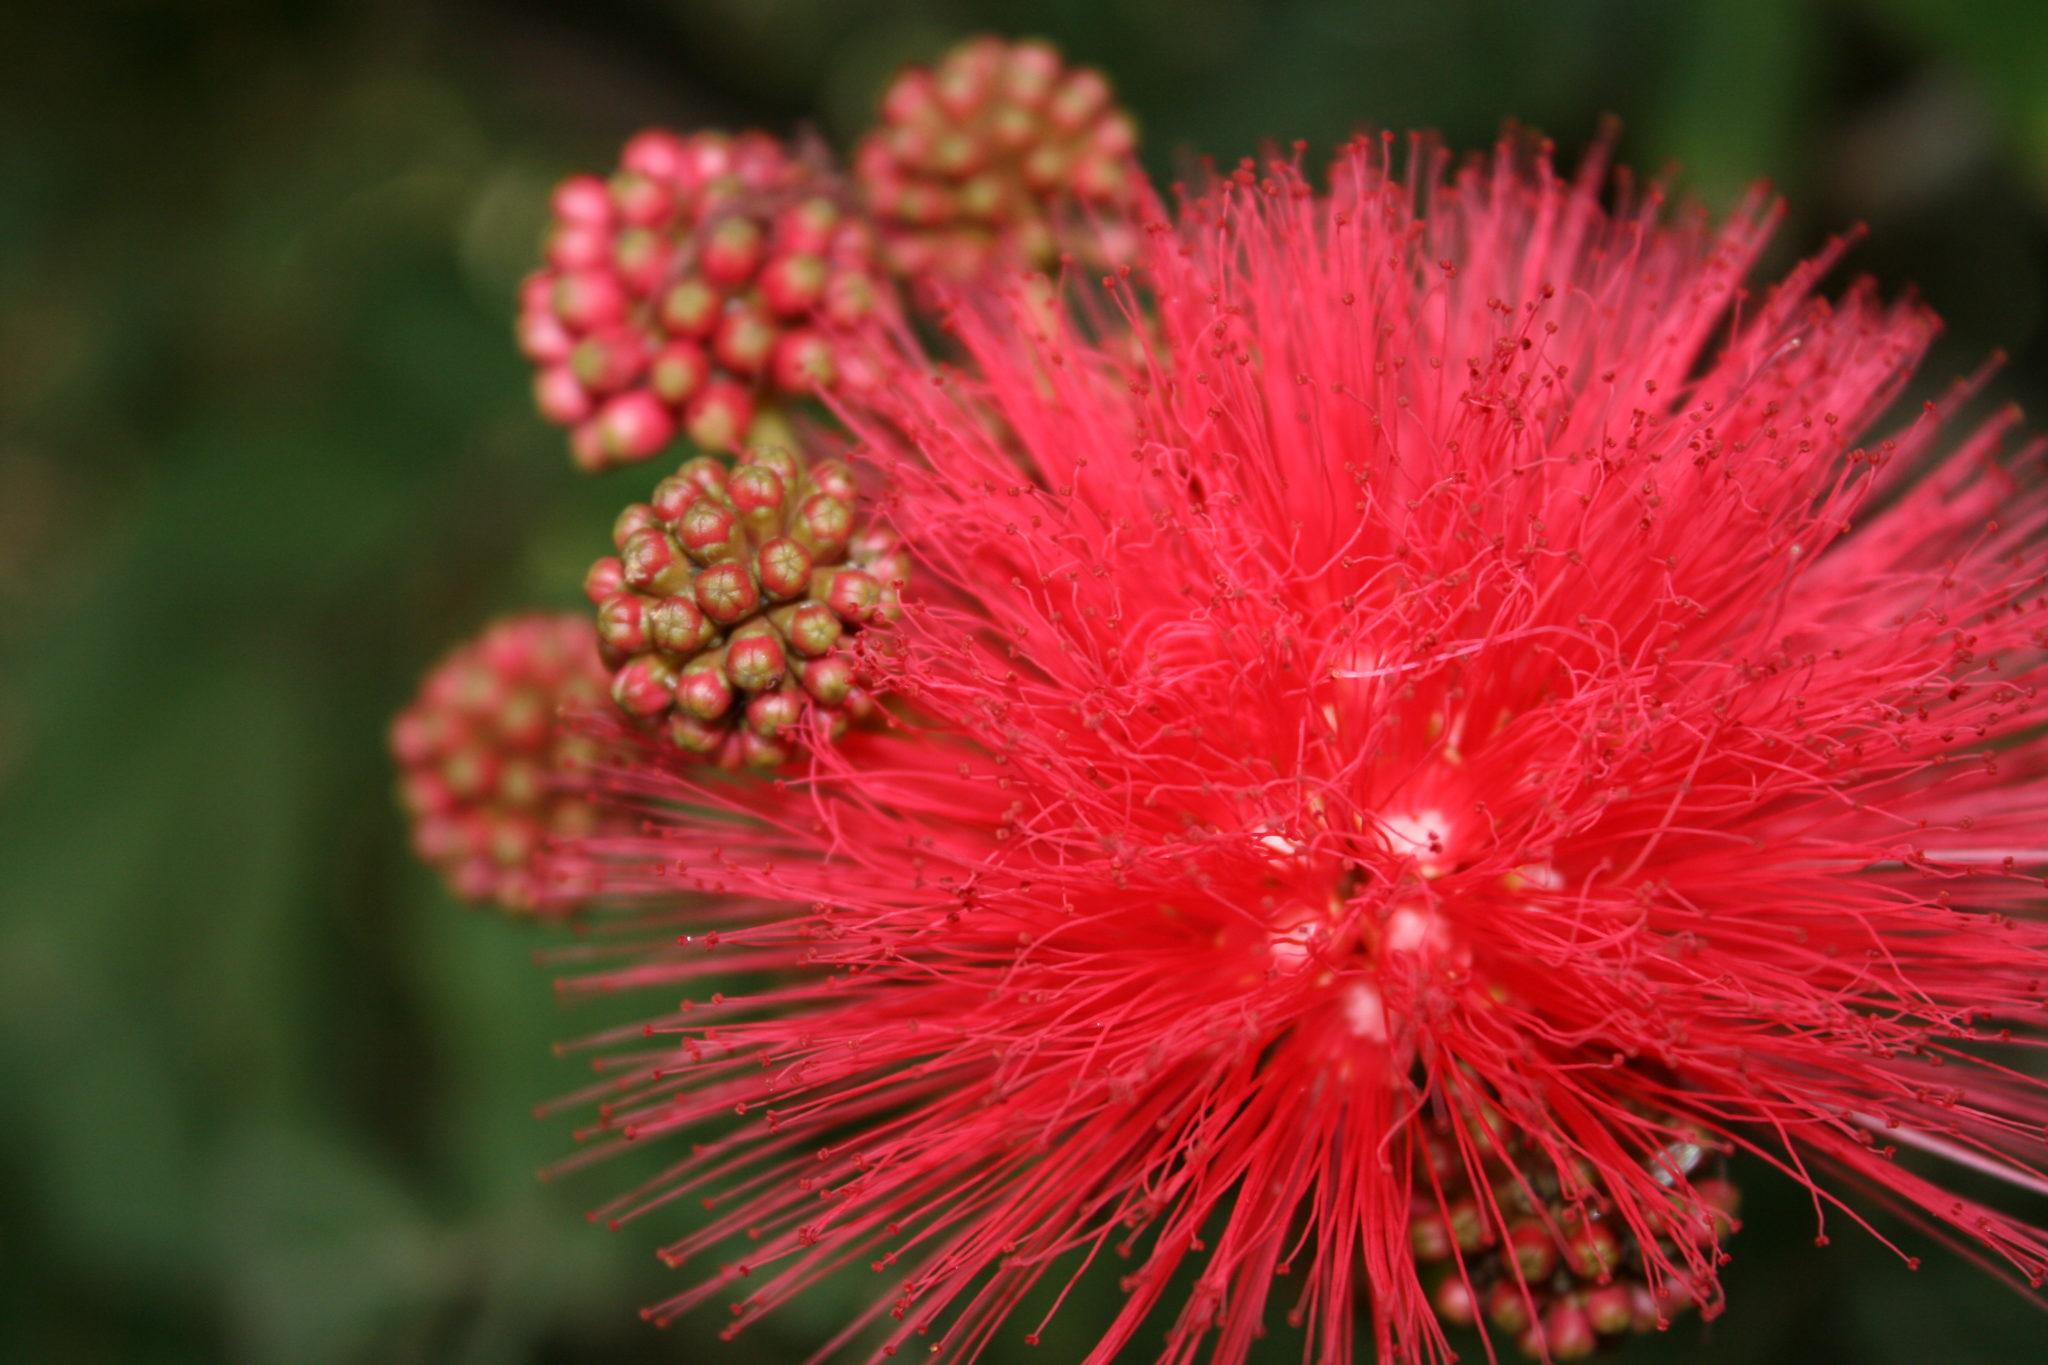 Pink Powder Puff - Calliandra haematocephala